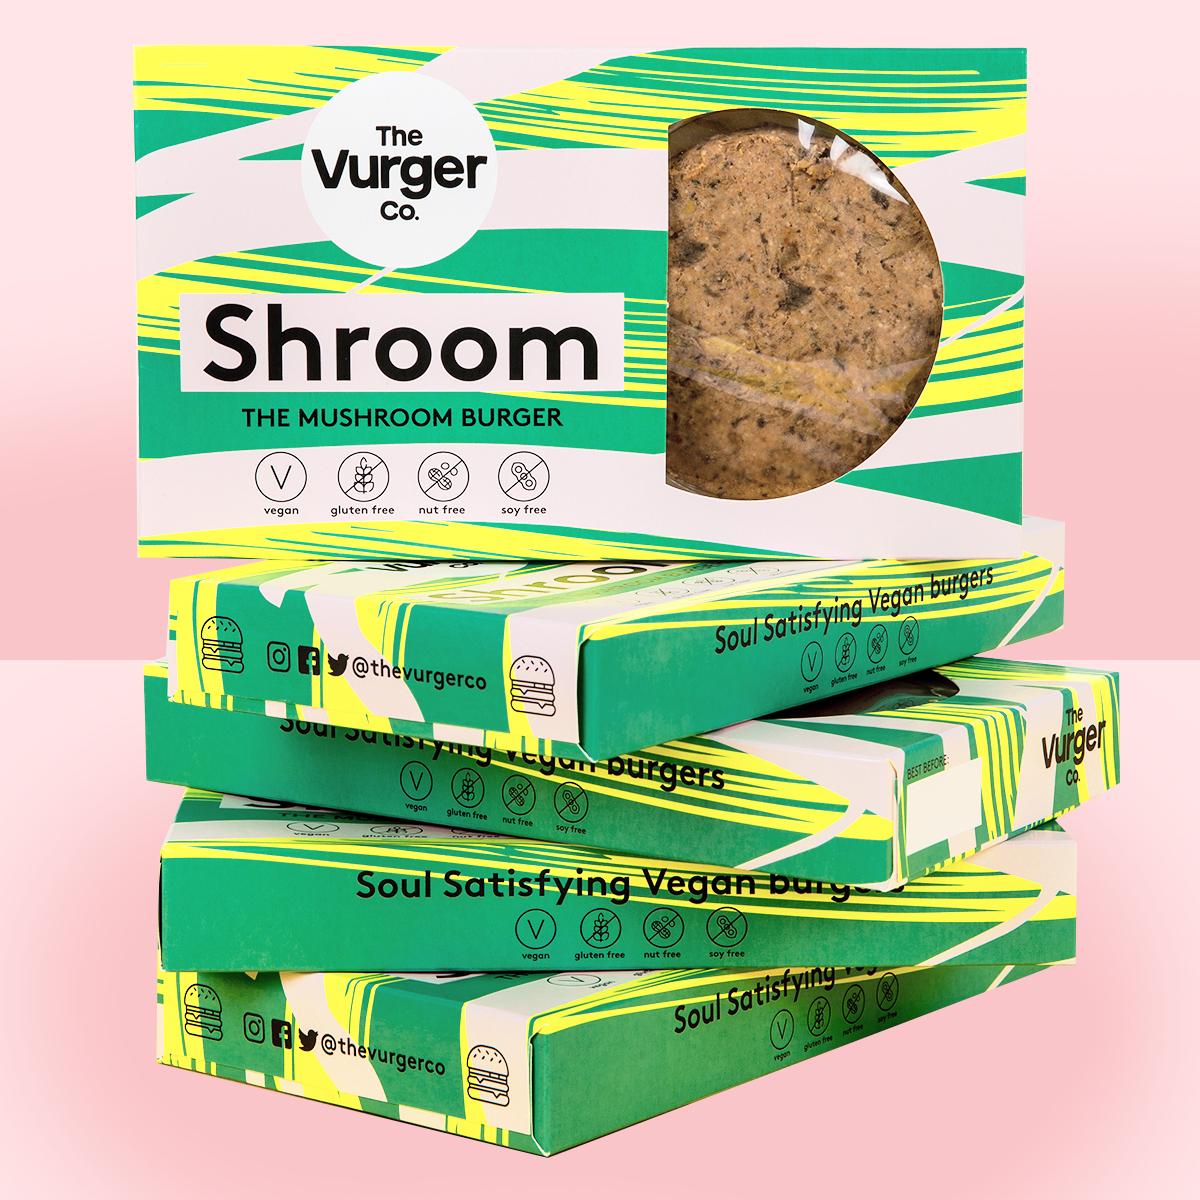 the-vurger-co-shroom.jpg